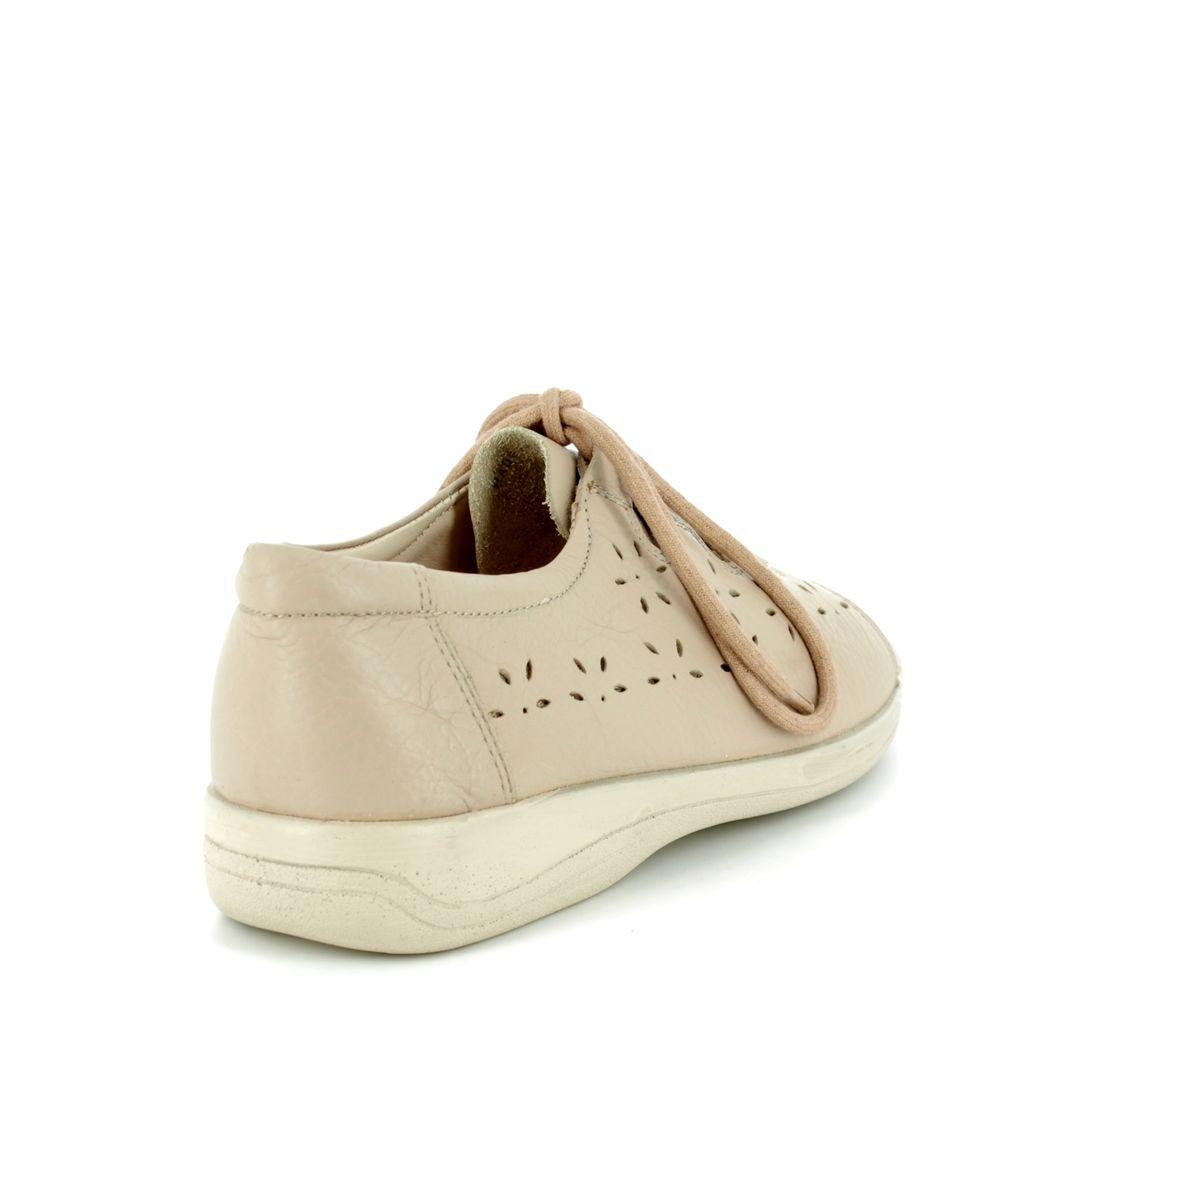 67508d890 Padders Sandals - Beige - 0762 34 COASTLINE 2E